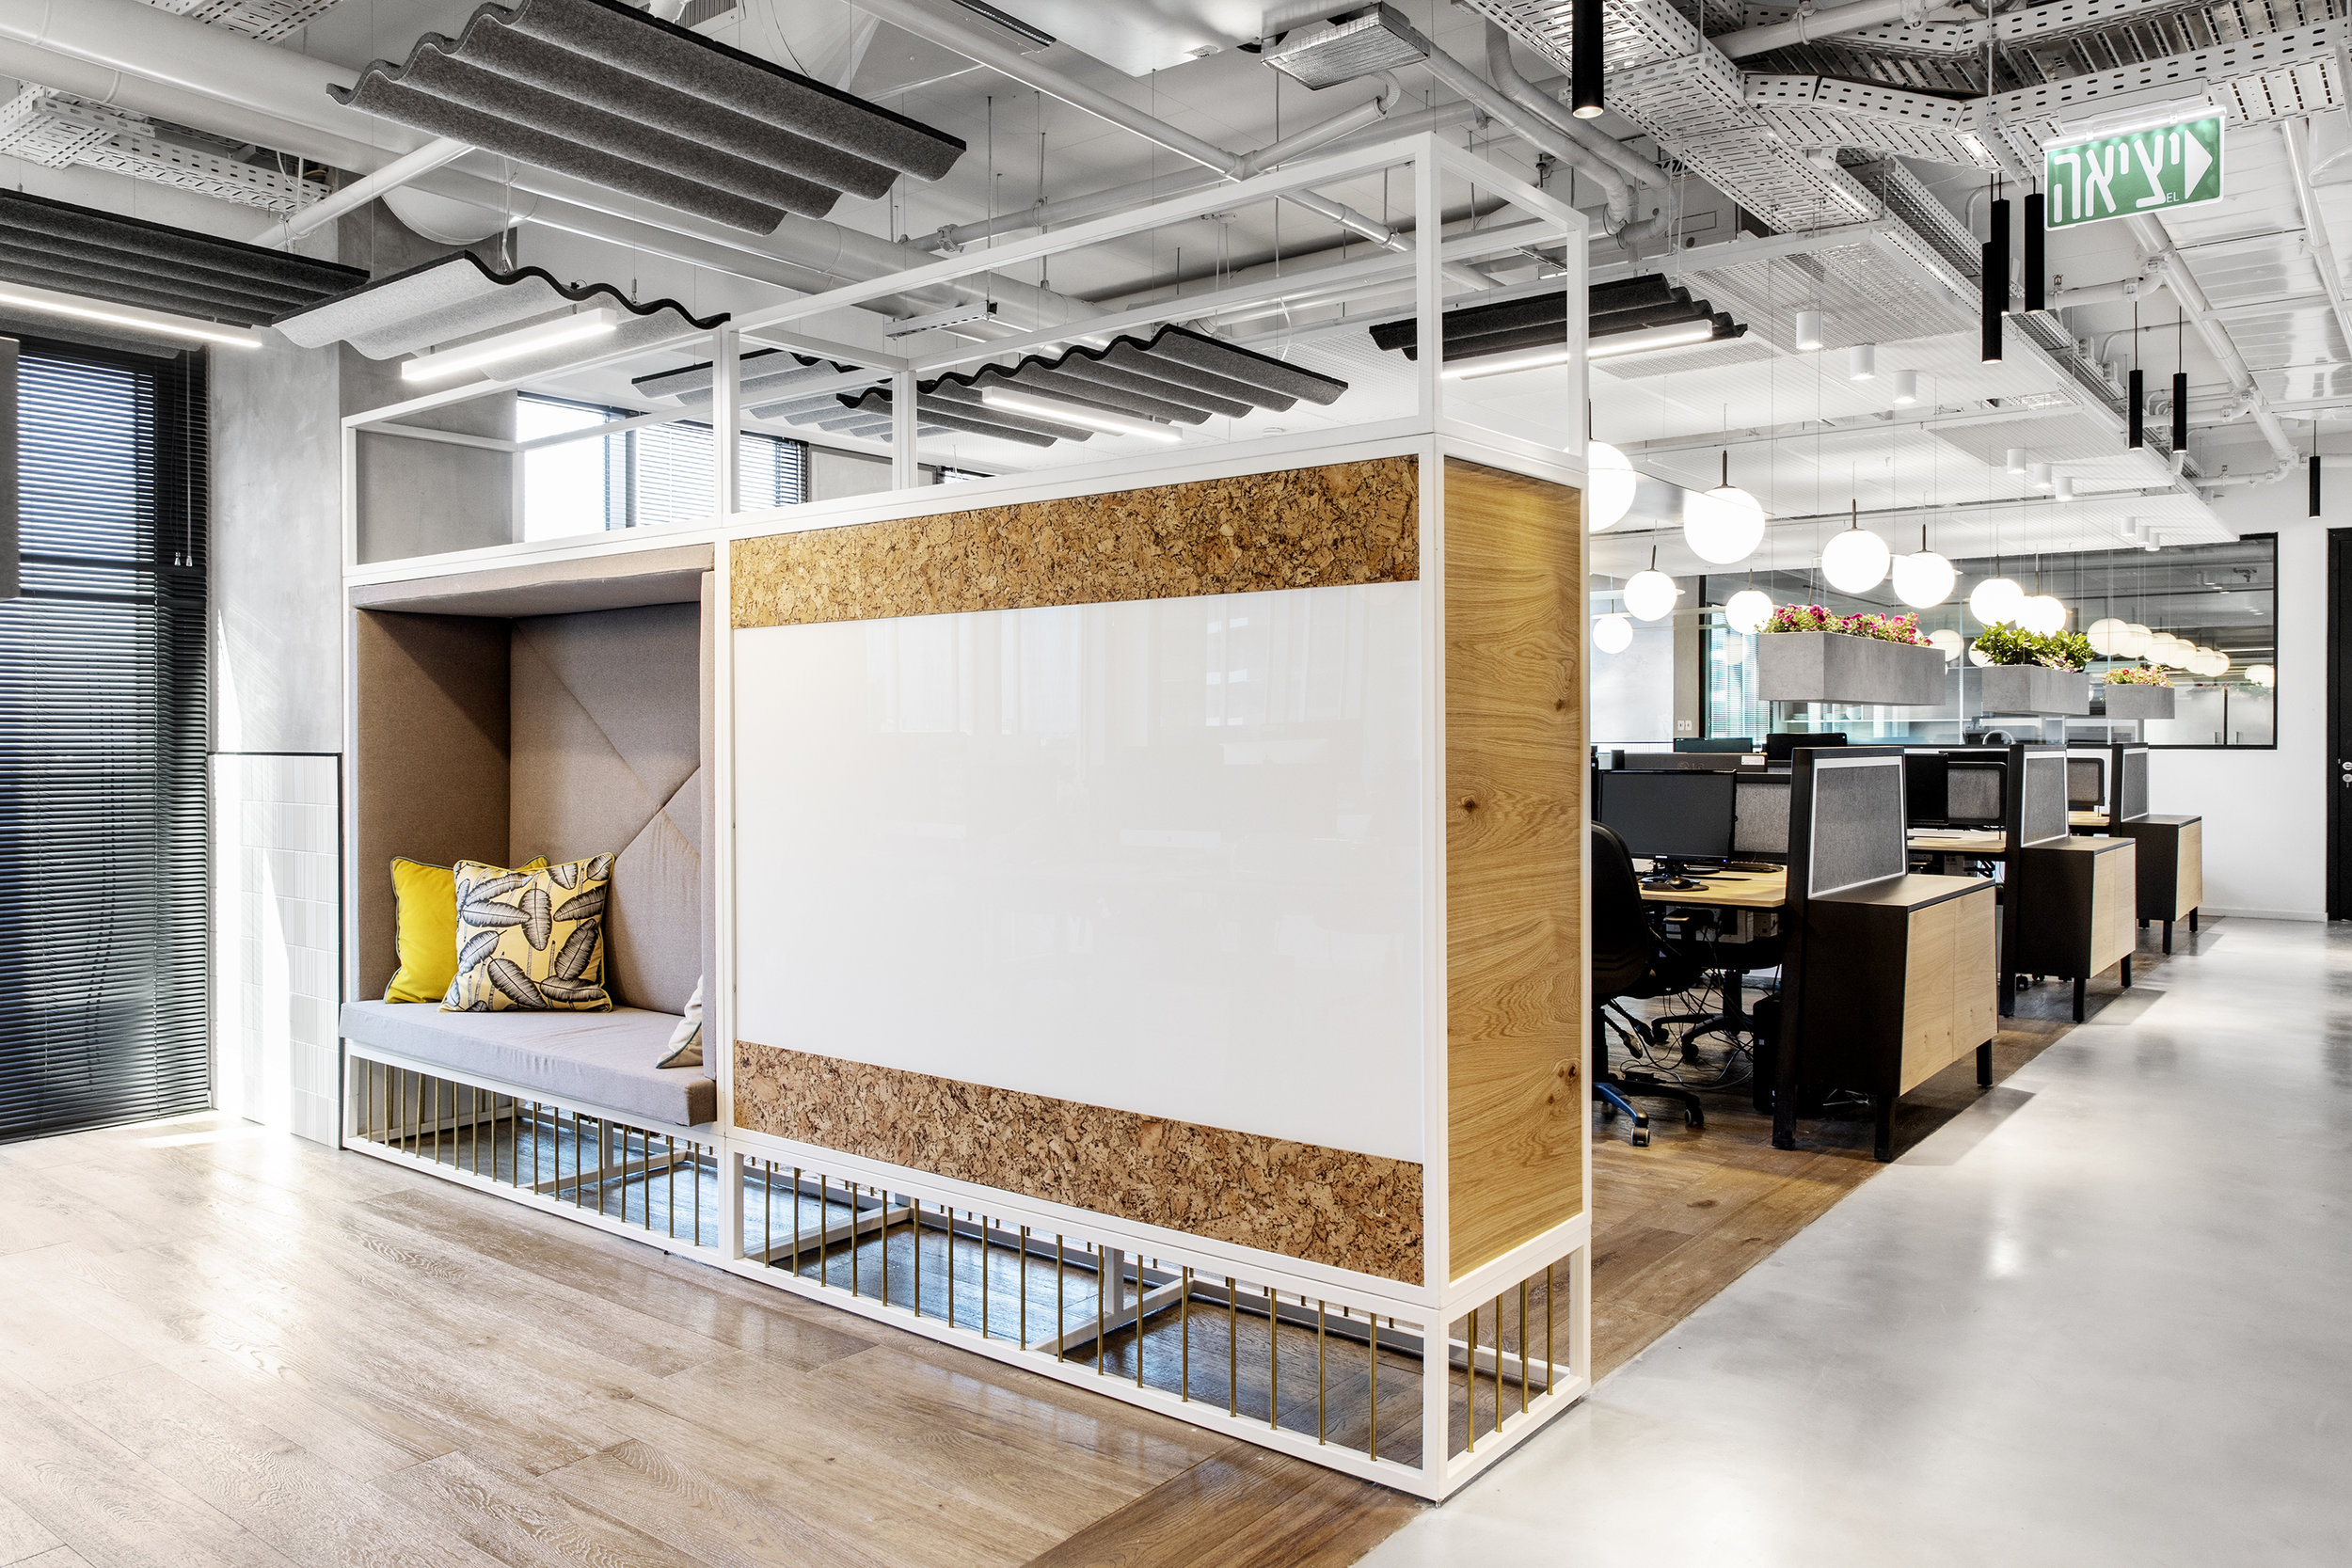 R2NET OFFICES - ROY DAVID ARCHITECTURE  STUDIO - רואי דוד אדריכלות סטודיו אדריכלים - אר2נט (35).jpg